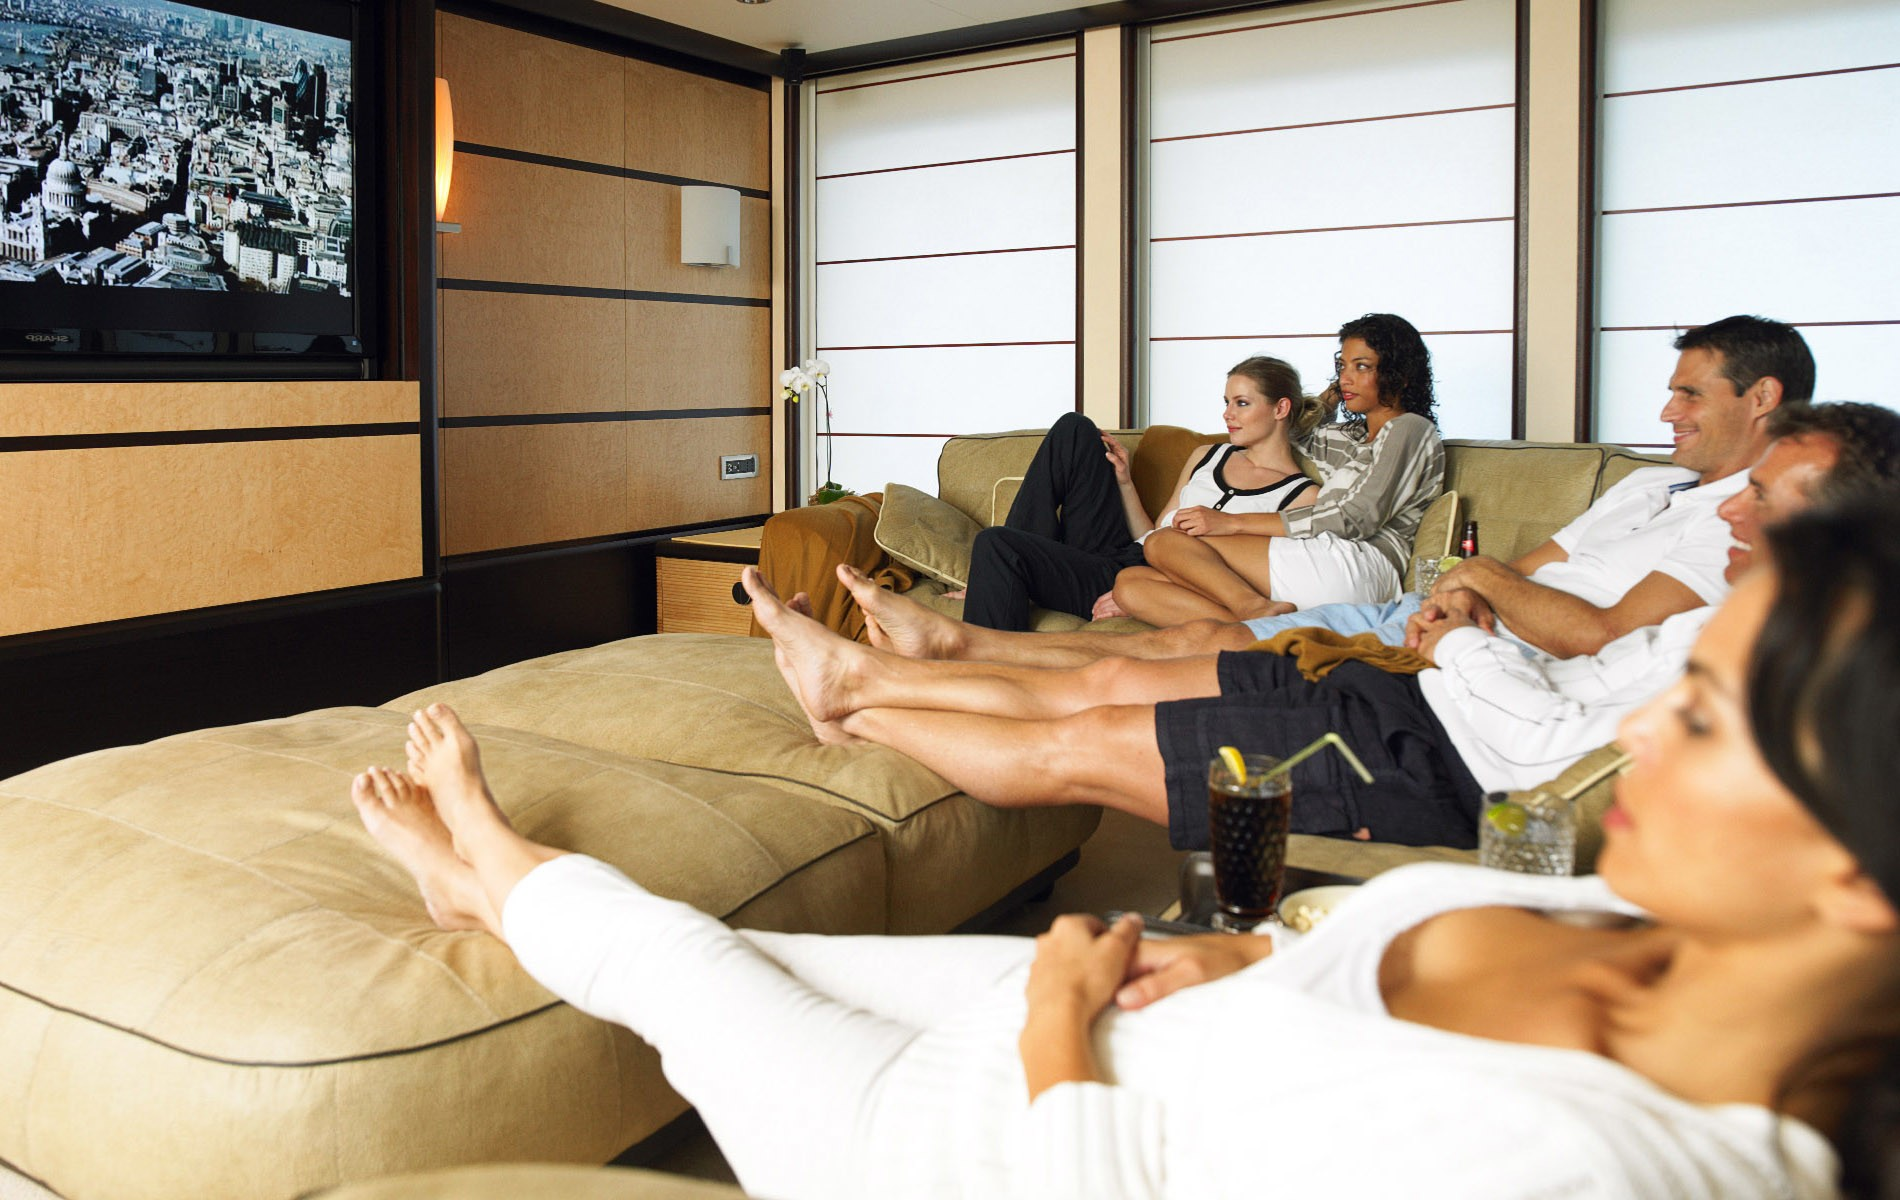 Movie Cinema In Premier Saloon On Board Yacht HARLE